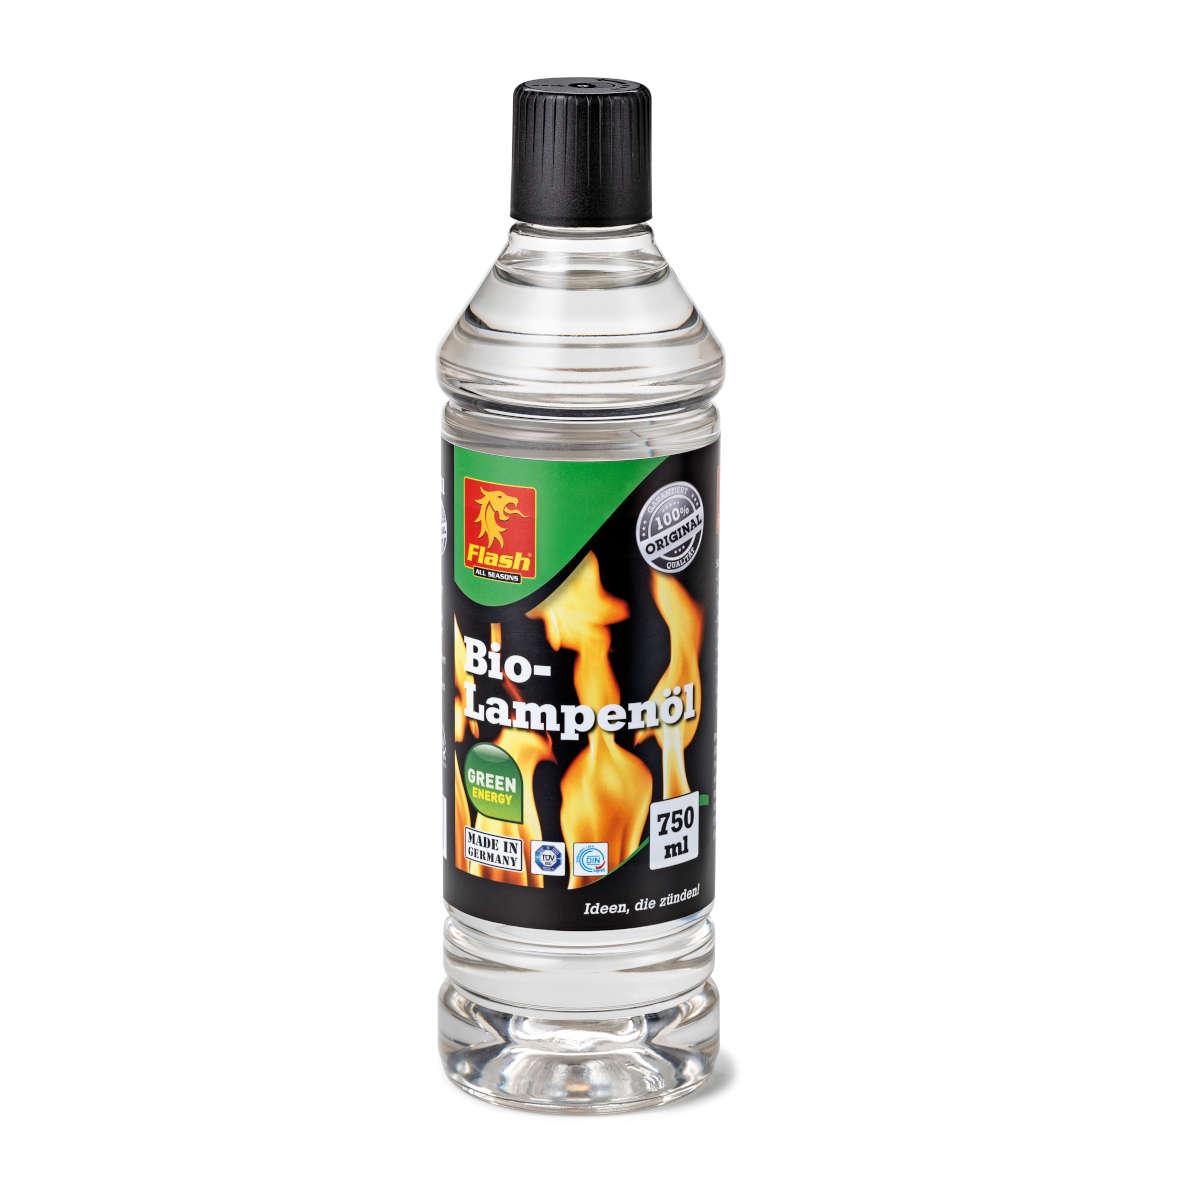 Bio-Lampenöl 750 ml